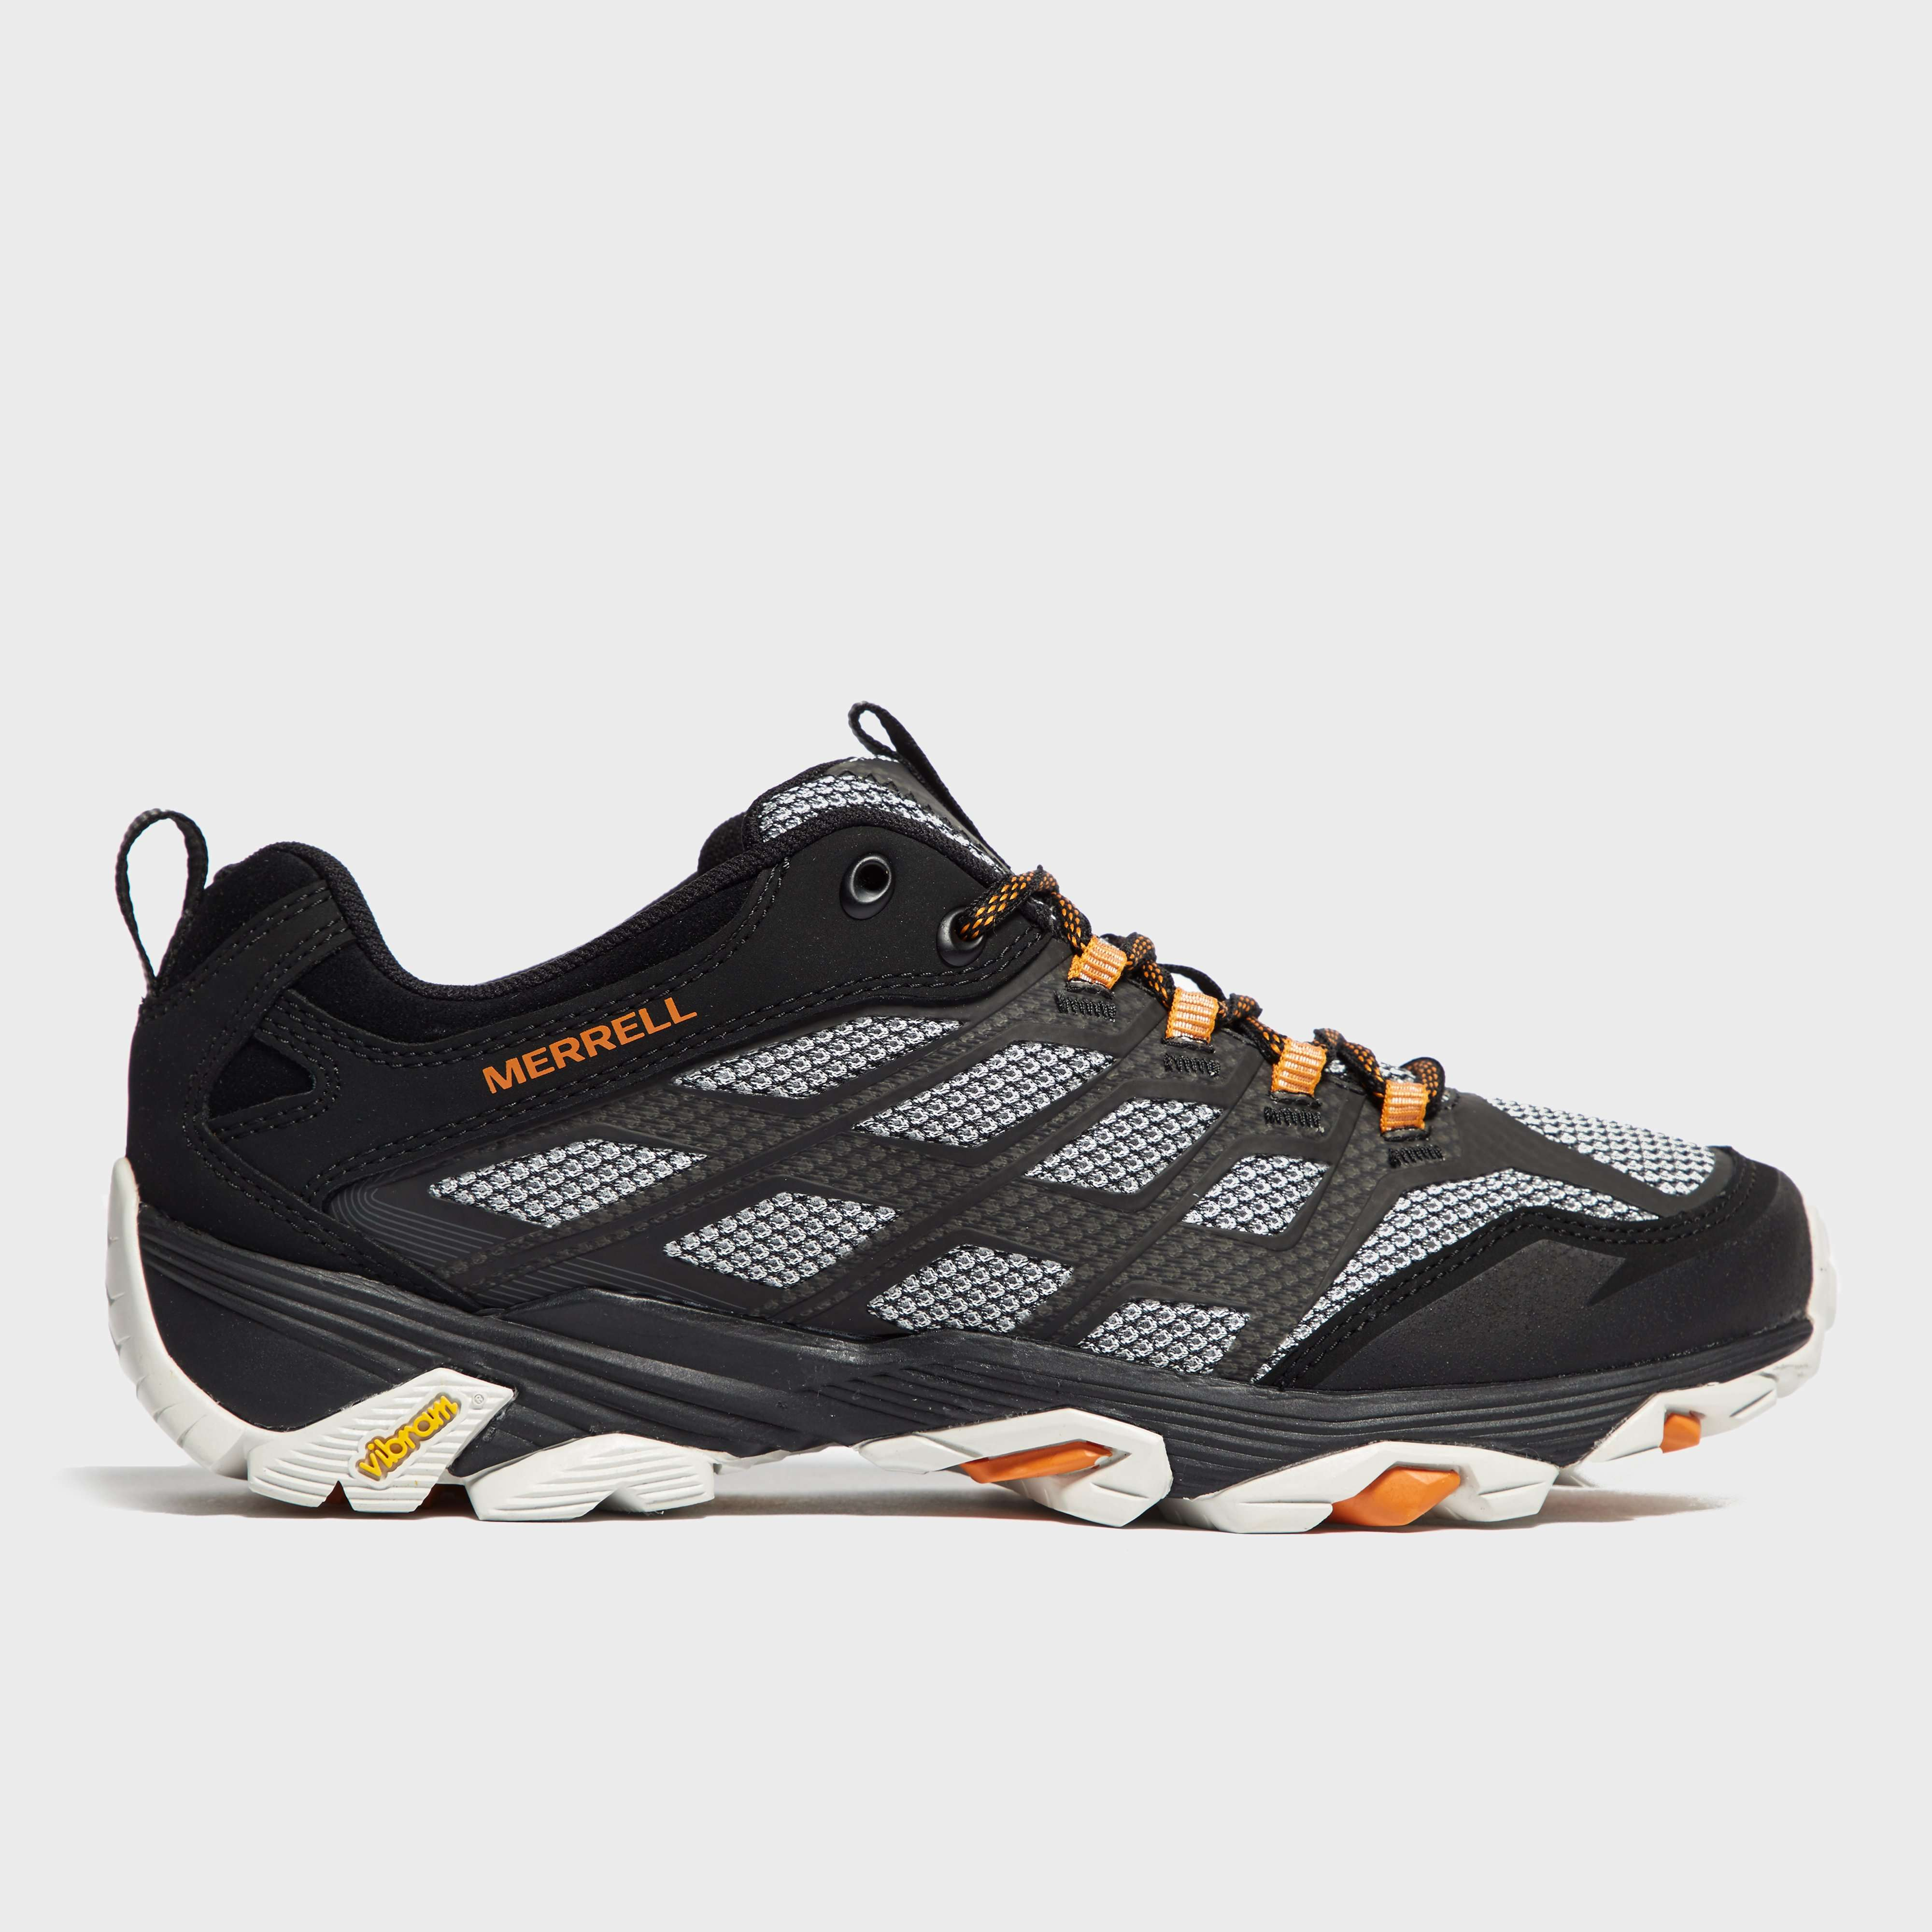 MERRELL Men's Moab FST Multi-Sport Shoe